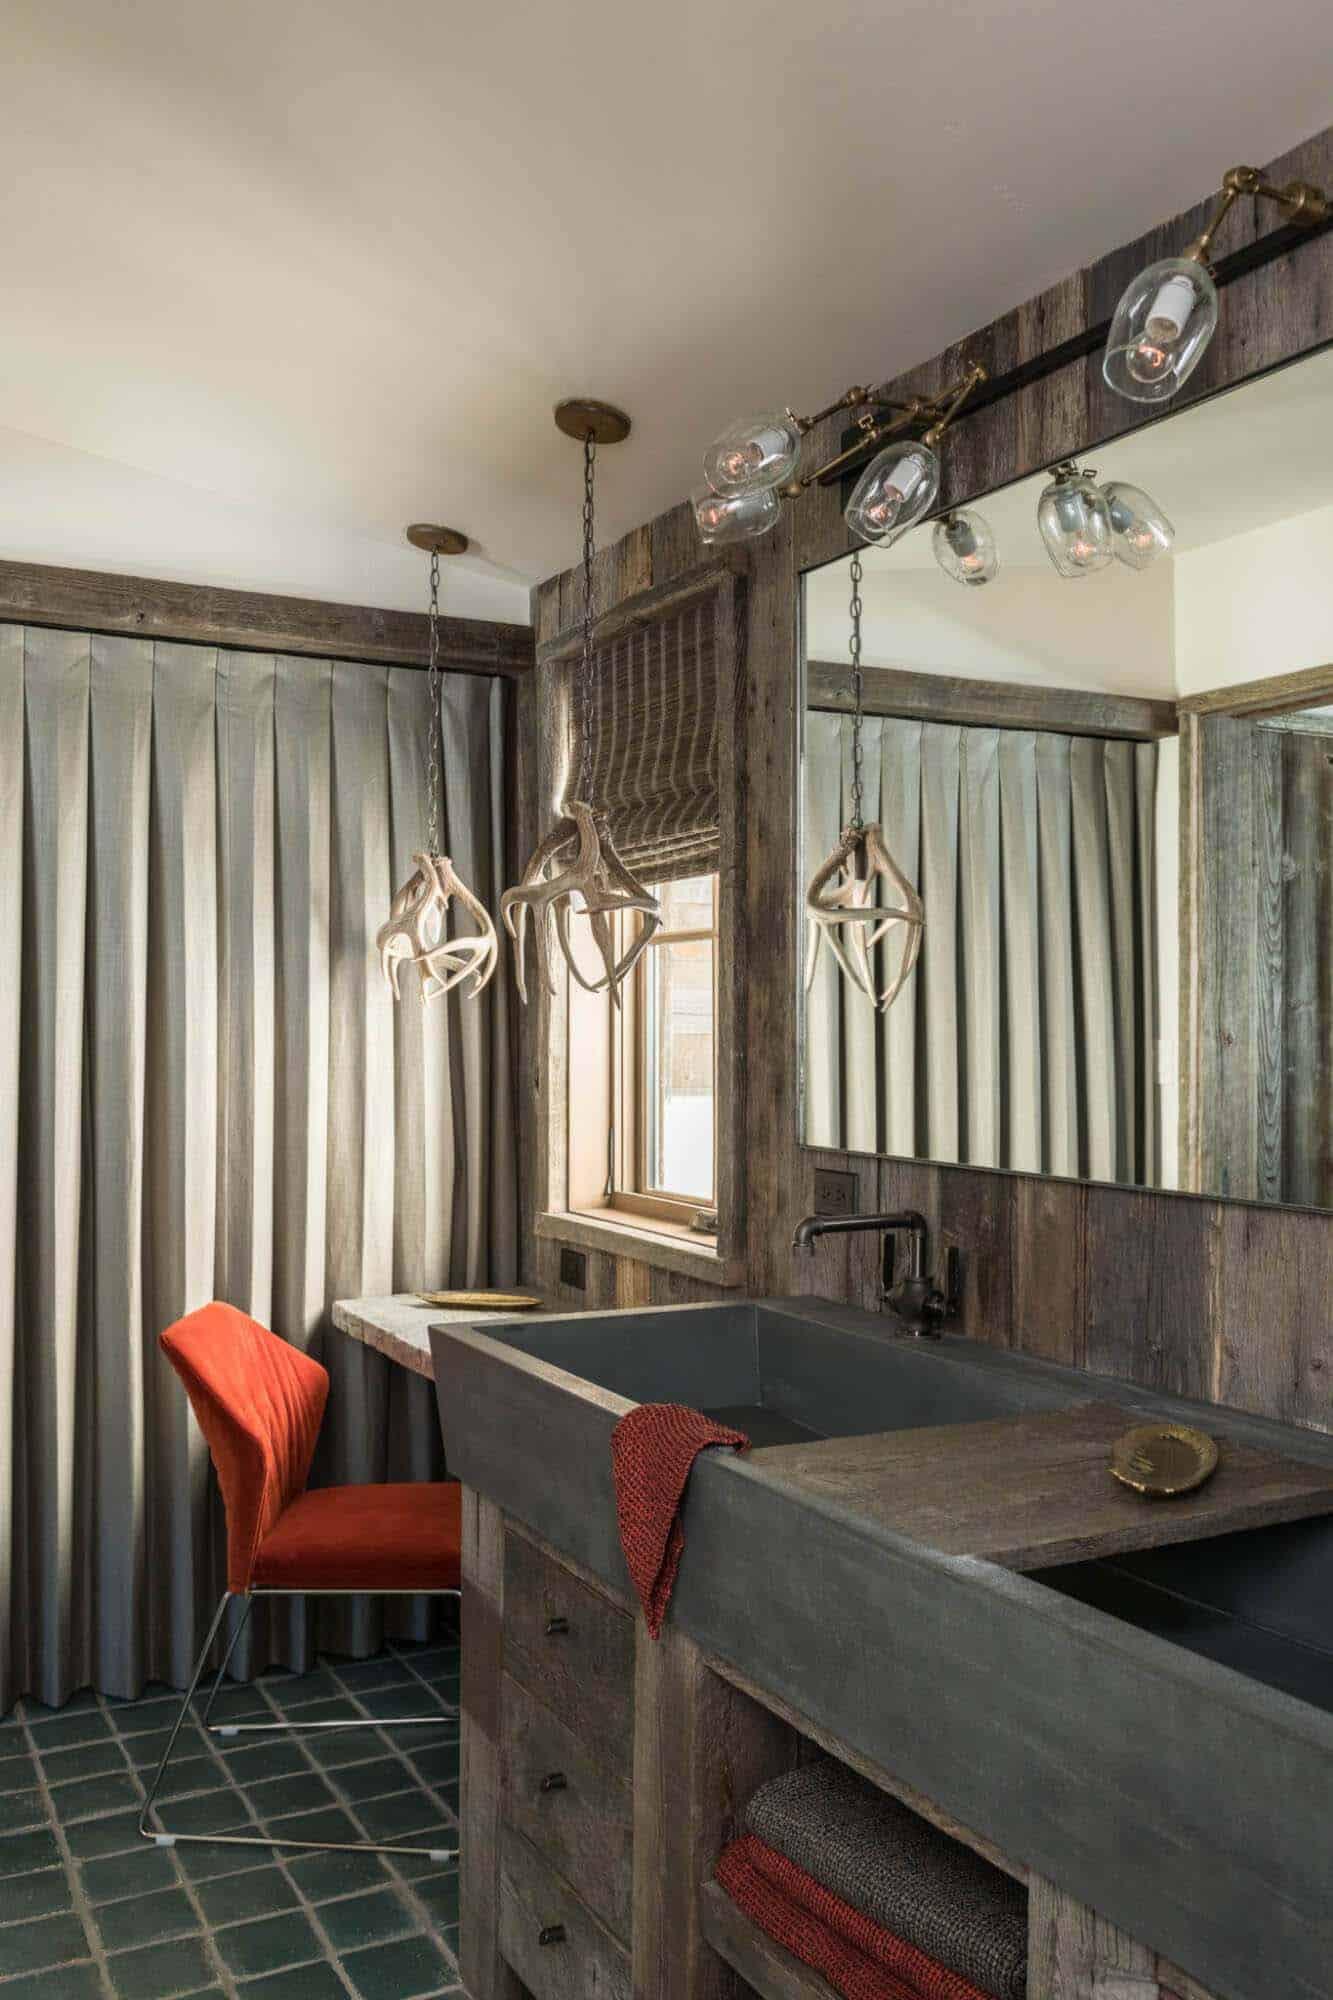 guest-house-rustic-bathroom